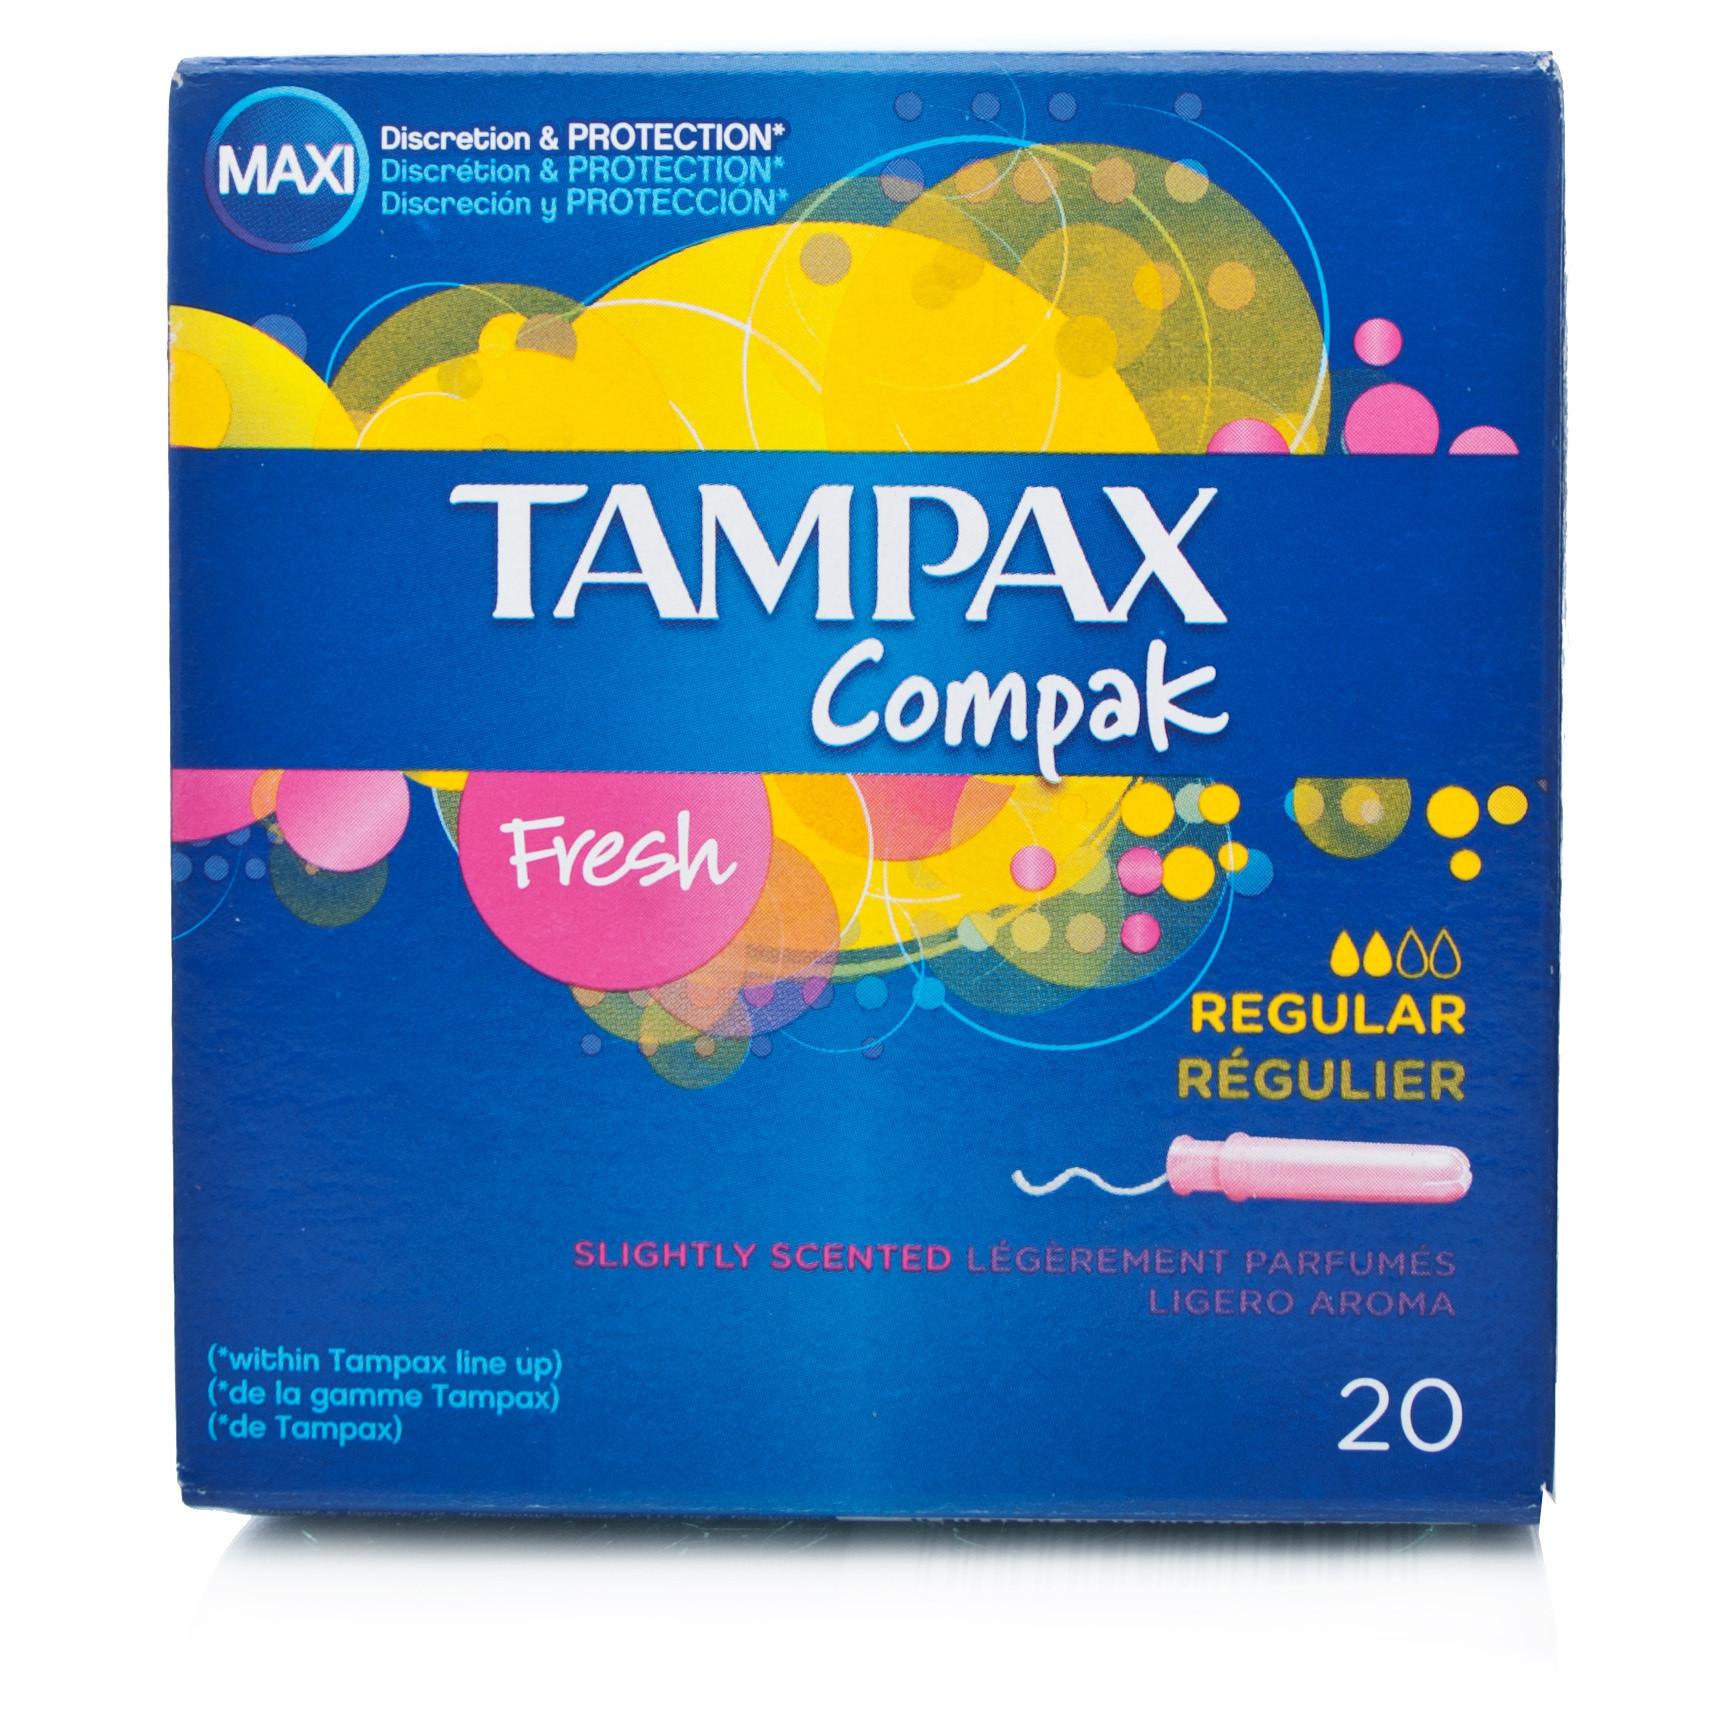 Tampax Compak Freshness Regular Tampons